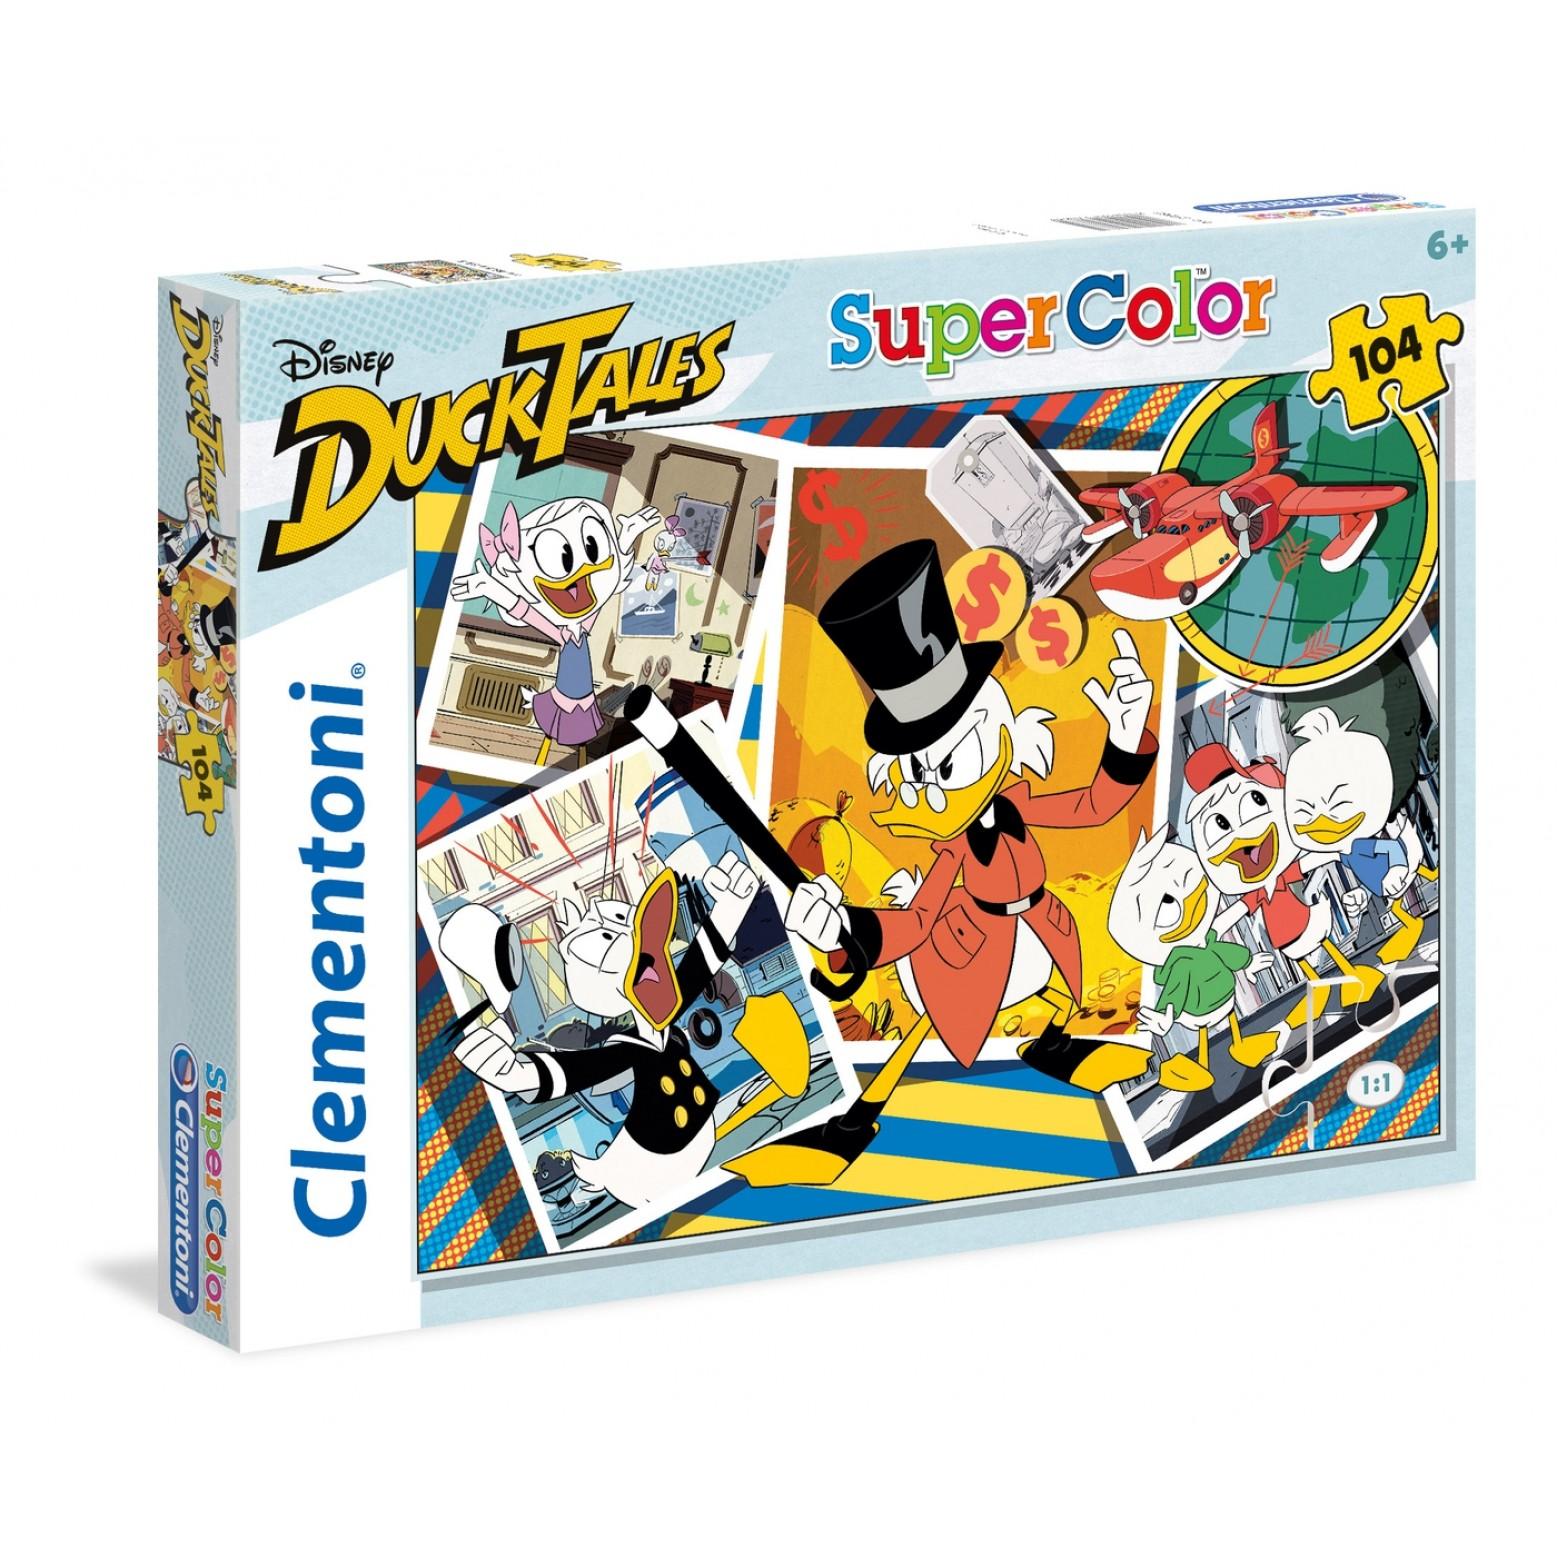 Clementoni Disney Ducktales puzzel 104 stukjes 6+